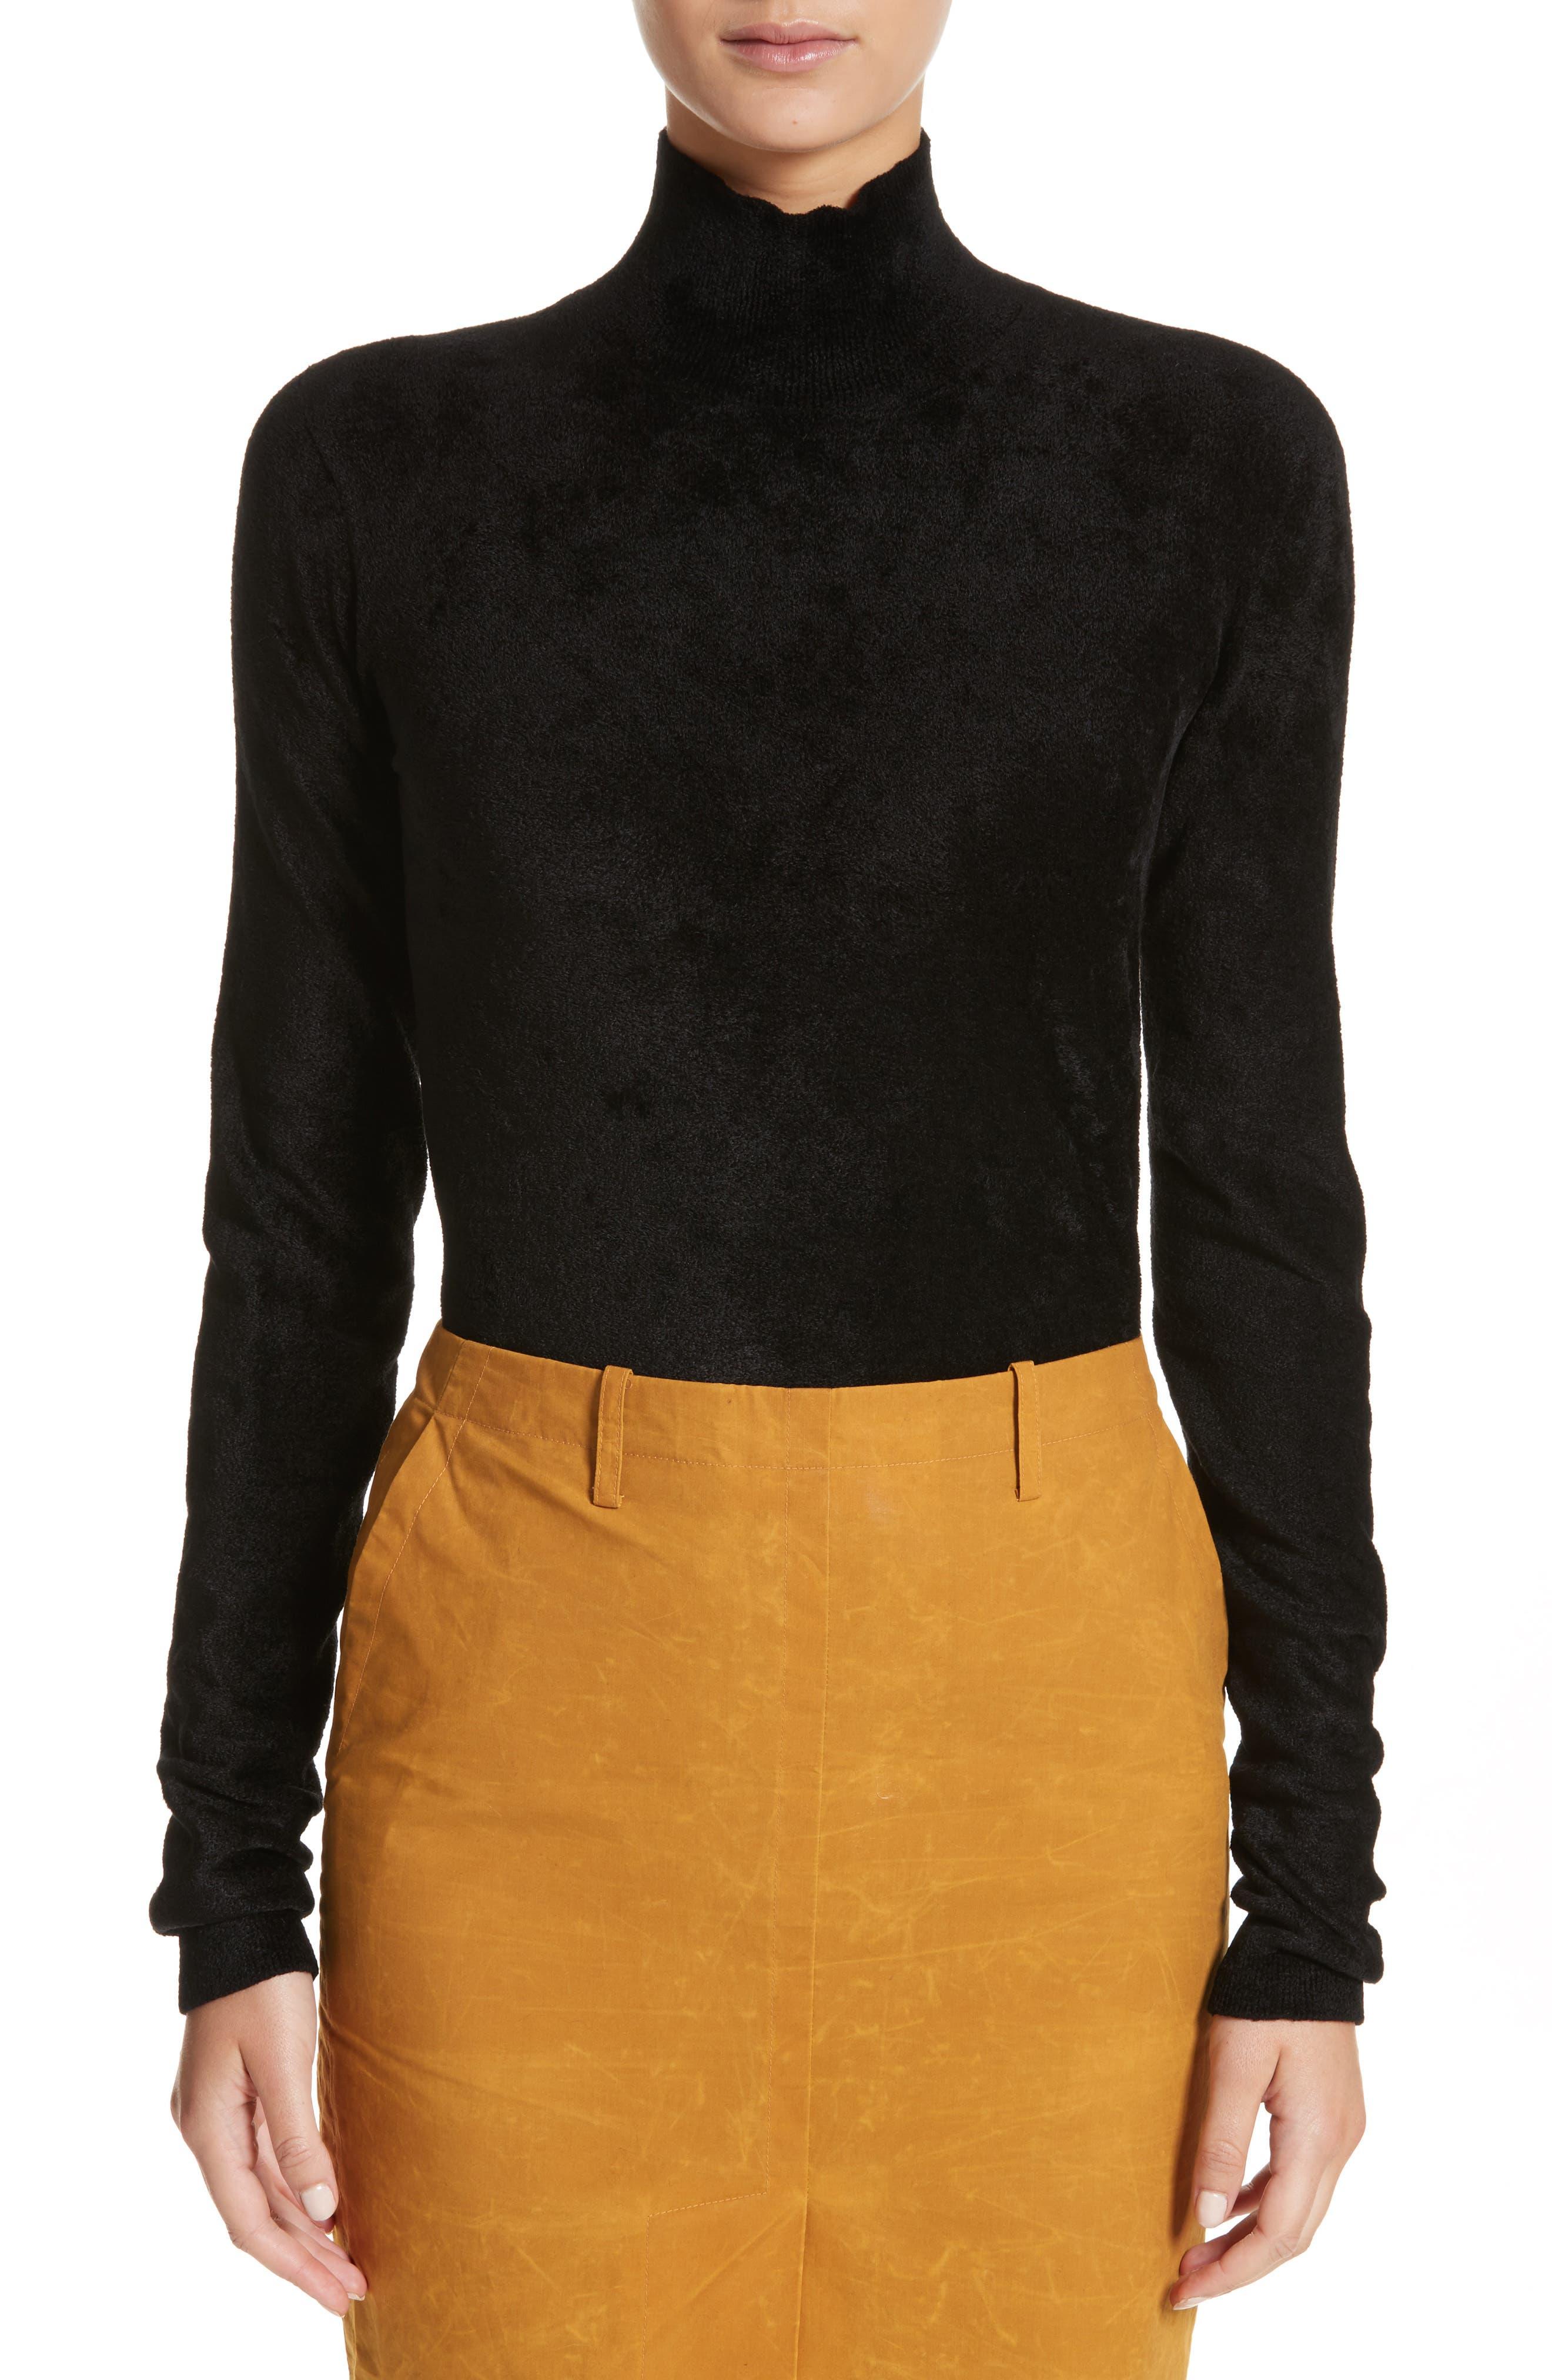 Chenille Turtleneck Sweater,                             Main thumbnail 1, color,                             00N99 Black